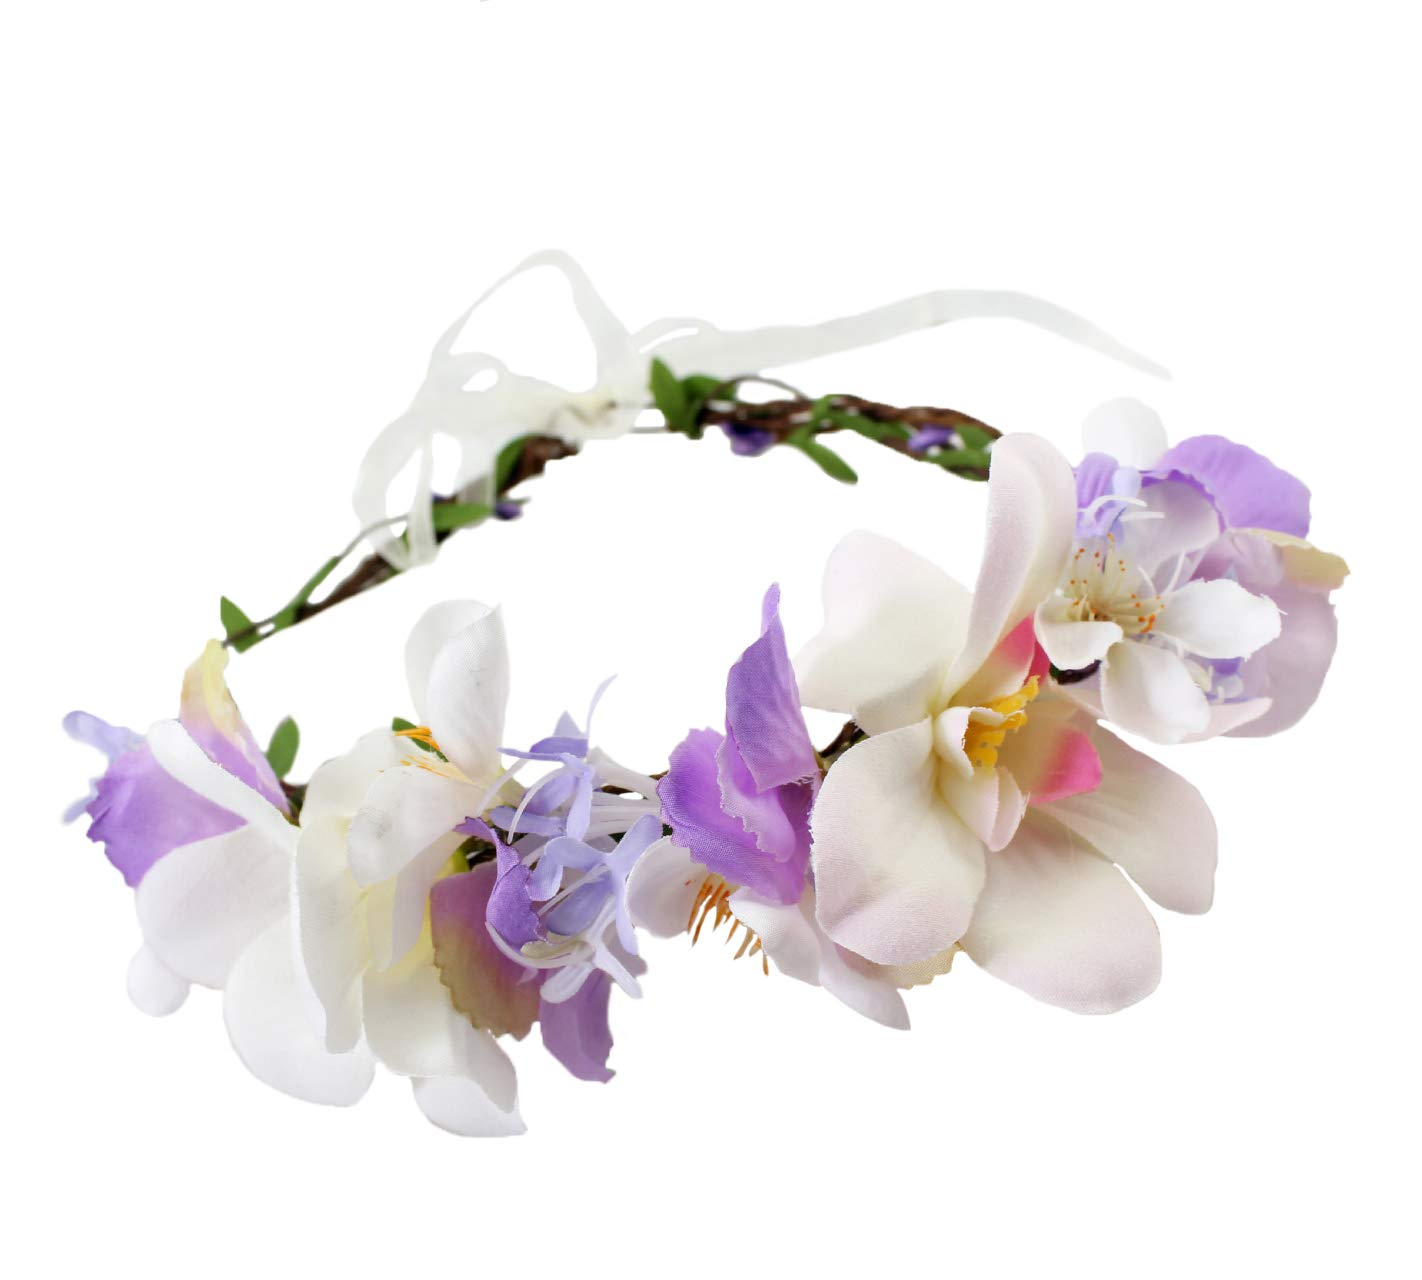 Vivivalue Handmade Boho Flower Crown Hair Wreath Halo Floral Garland Headband Headpiece with Ribbon Festival Wedding Purple